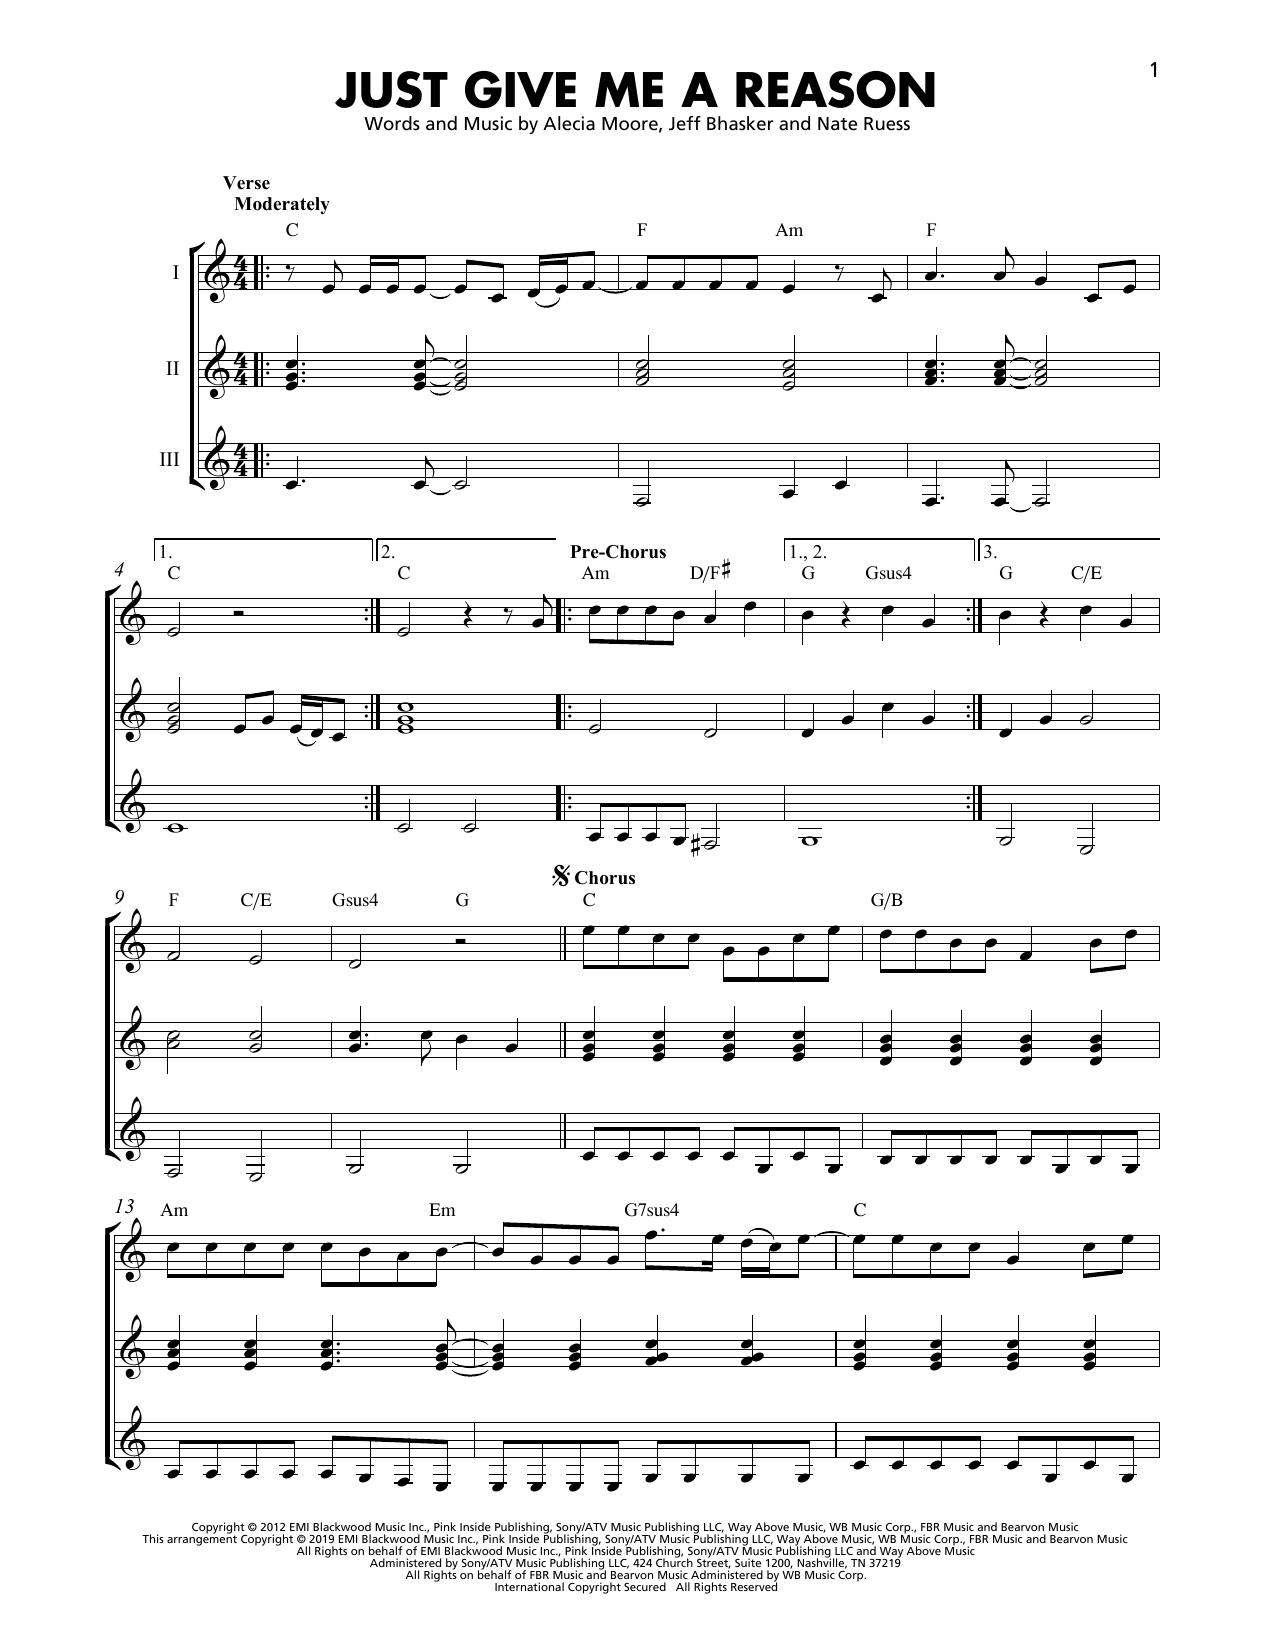 Pnk Just Give Me A Reason feat. Nate Ruess Sheet Music Notes, Chords    Download Printable Guitar Ensemble PDF Score   SKU 15